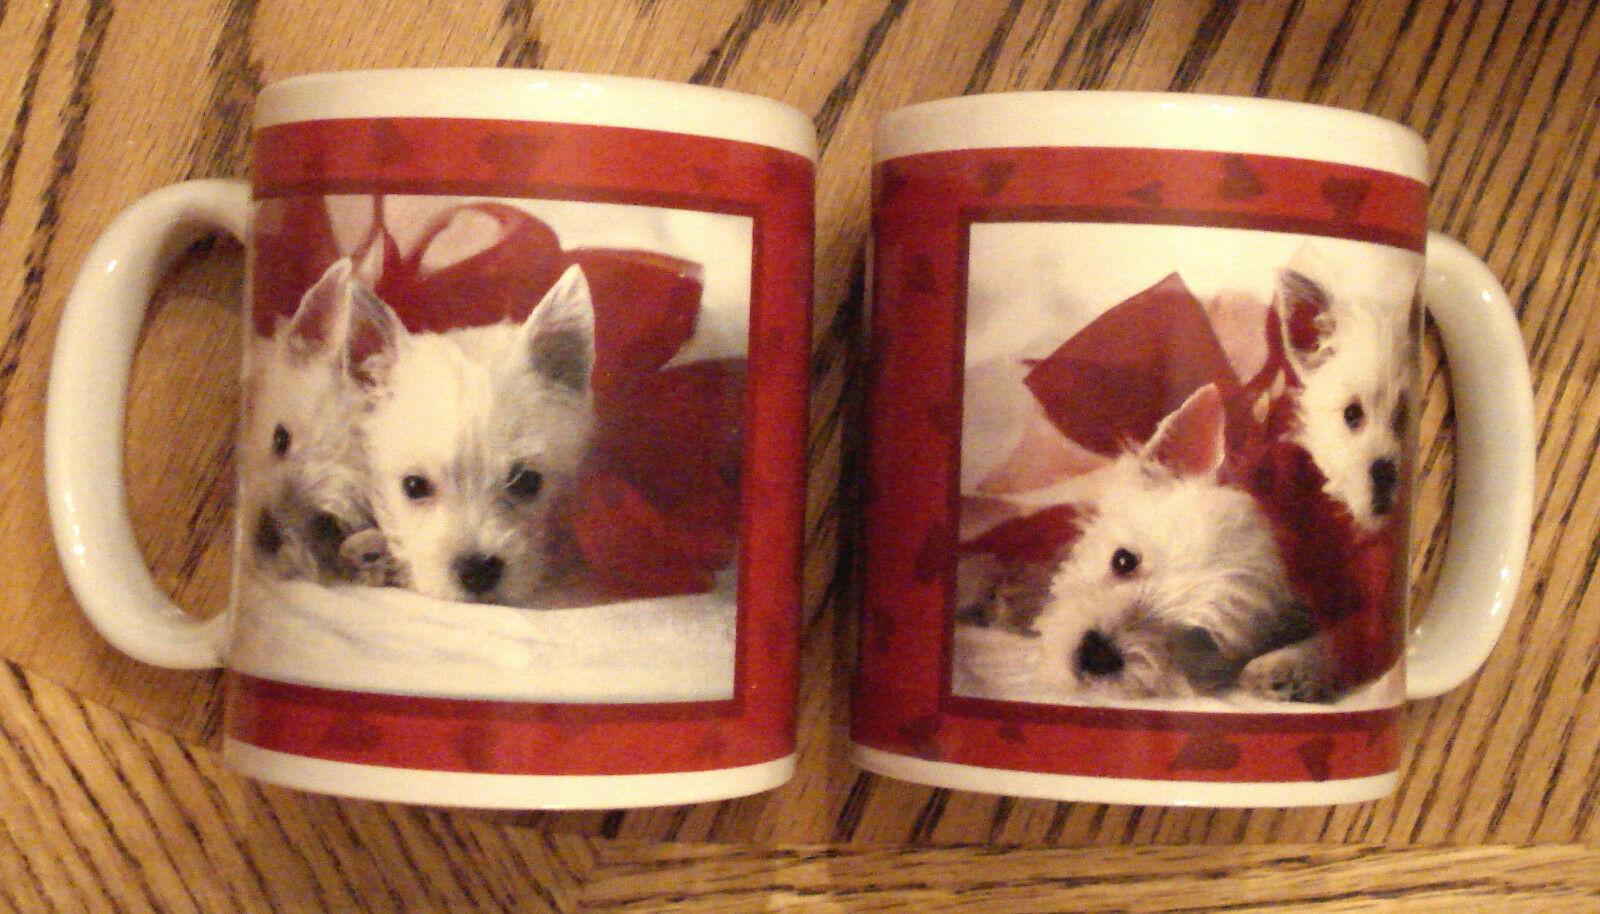 WEST HIGHLAND TERRIER COFFEE MUG LOT His & Hers Hallmark CAIRN WESTIE DOG LOVERS